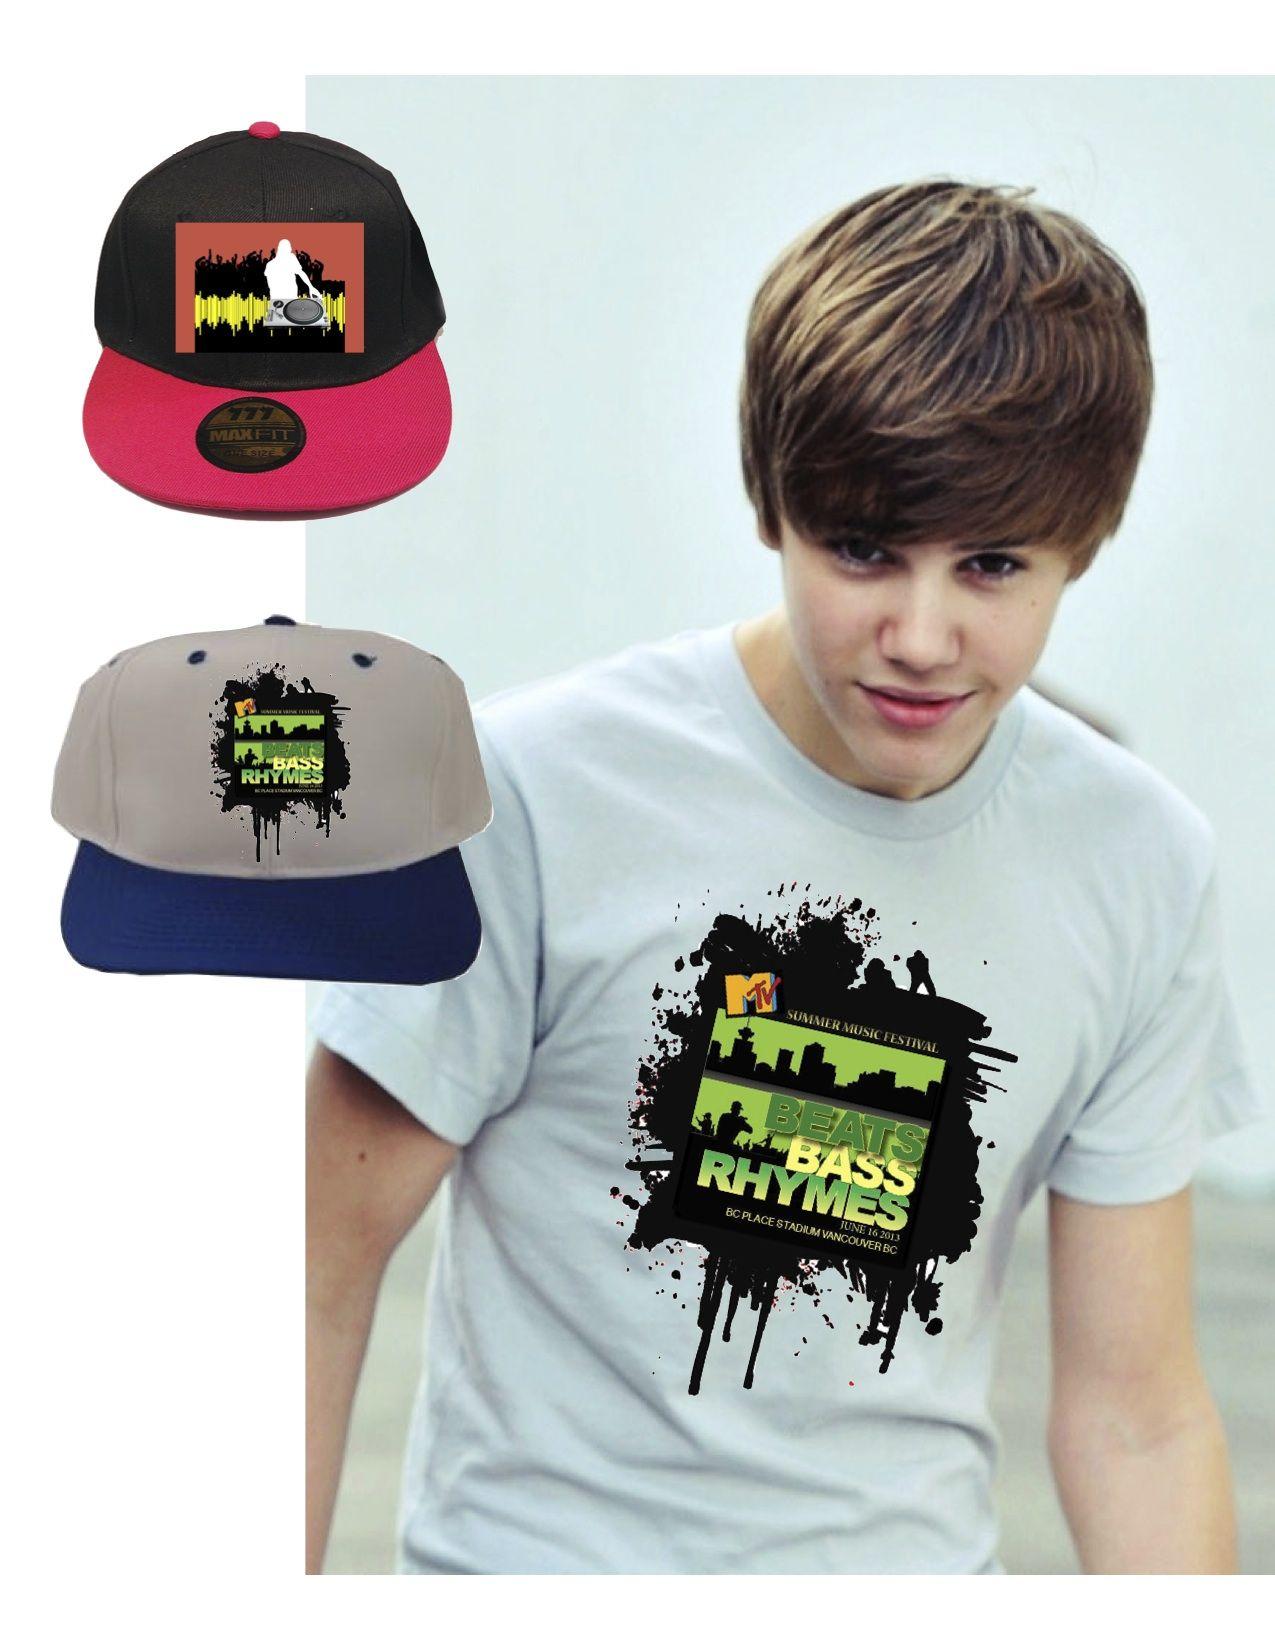 Design t shirt rollerblade - Mtv Summer Music Festival Tshirt Design